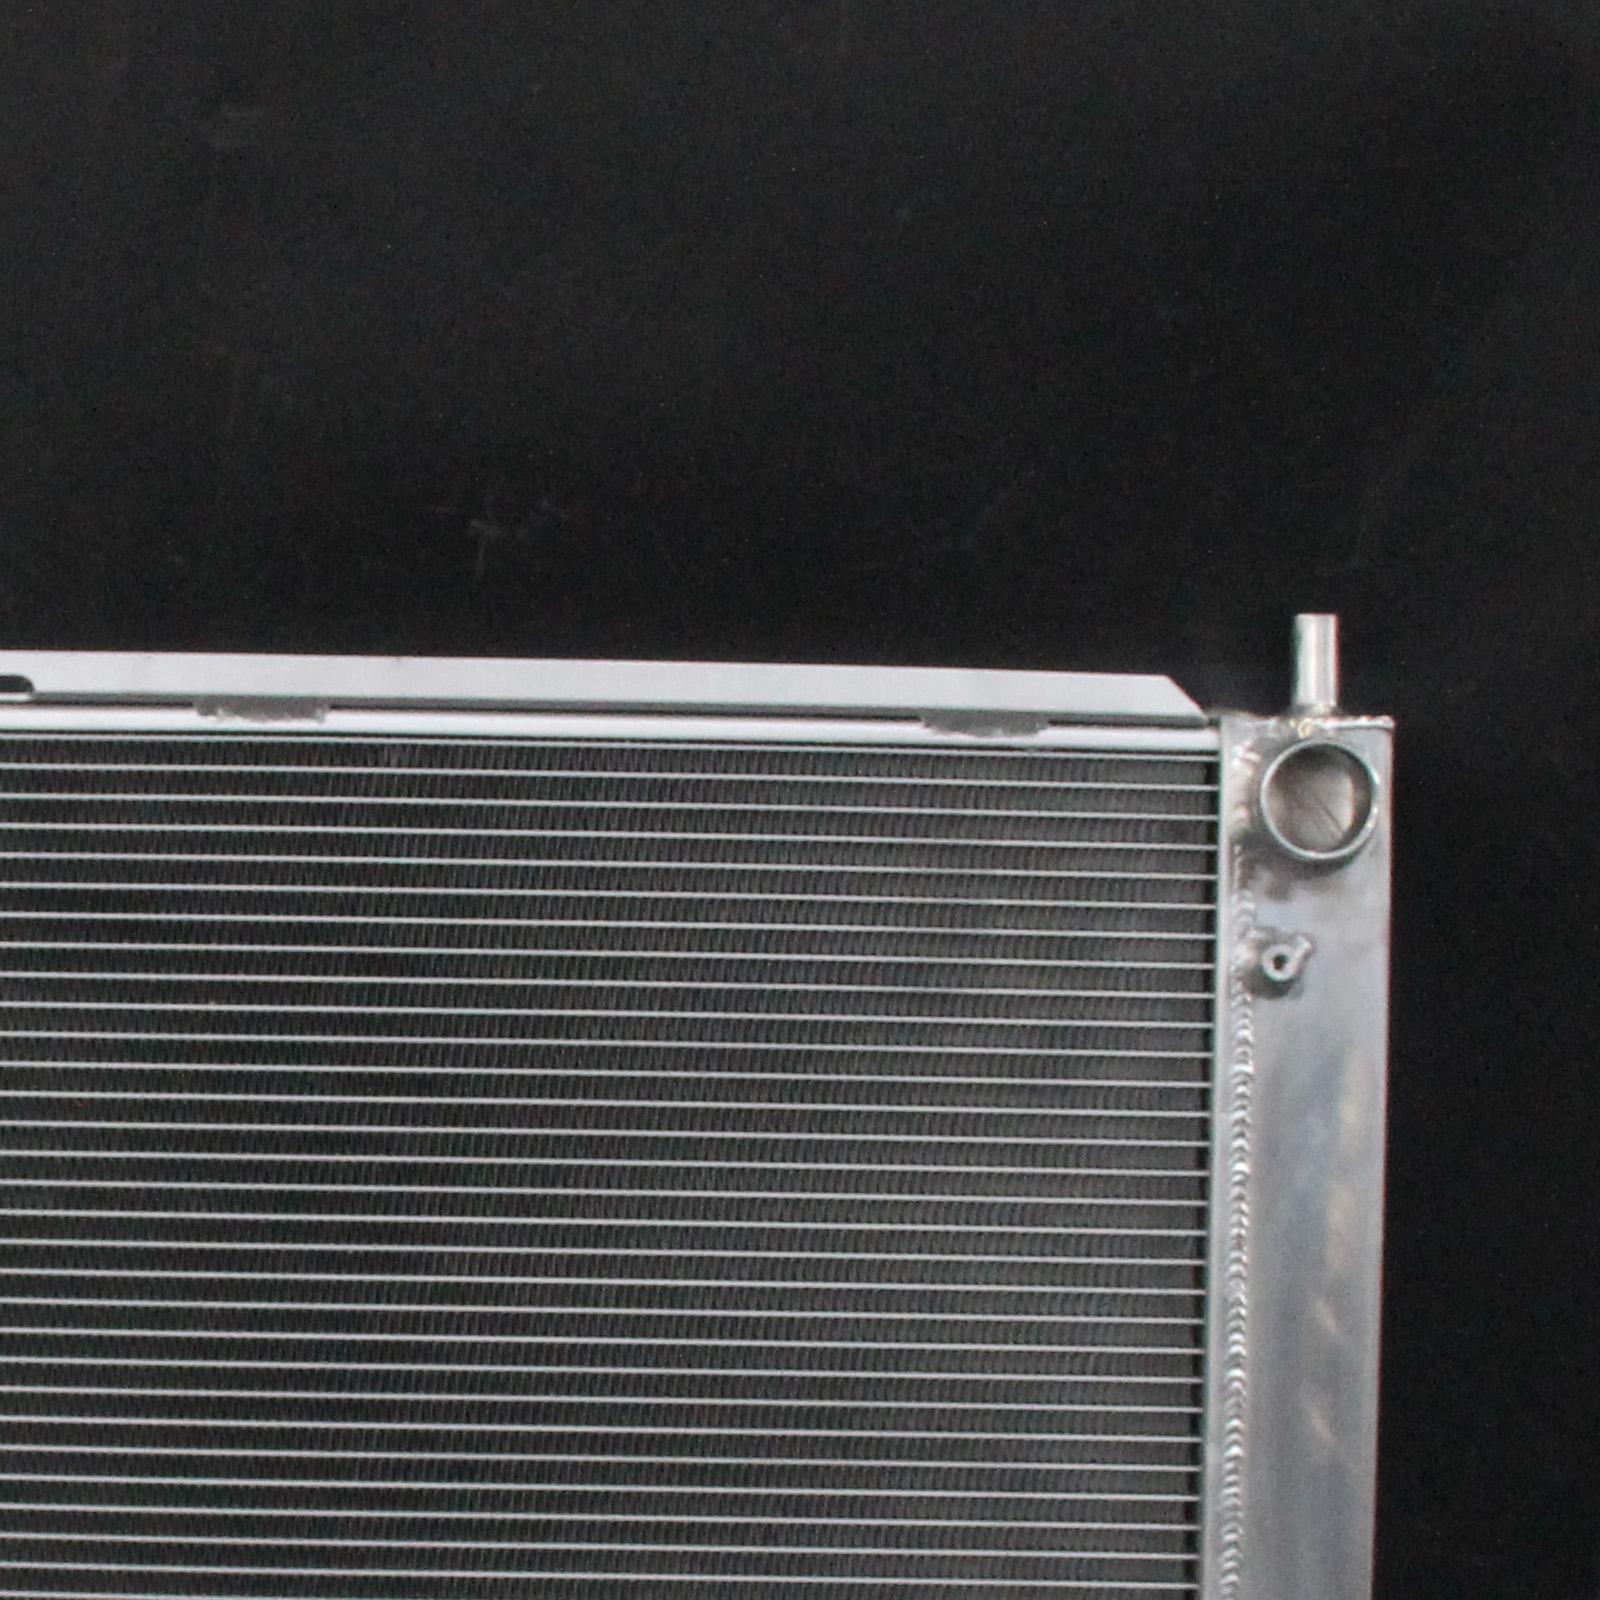 CU1775 3 Rows Aluminum Radiator For 1996 Ford Mustang GT SVT V8 4.6L